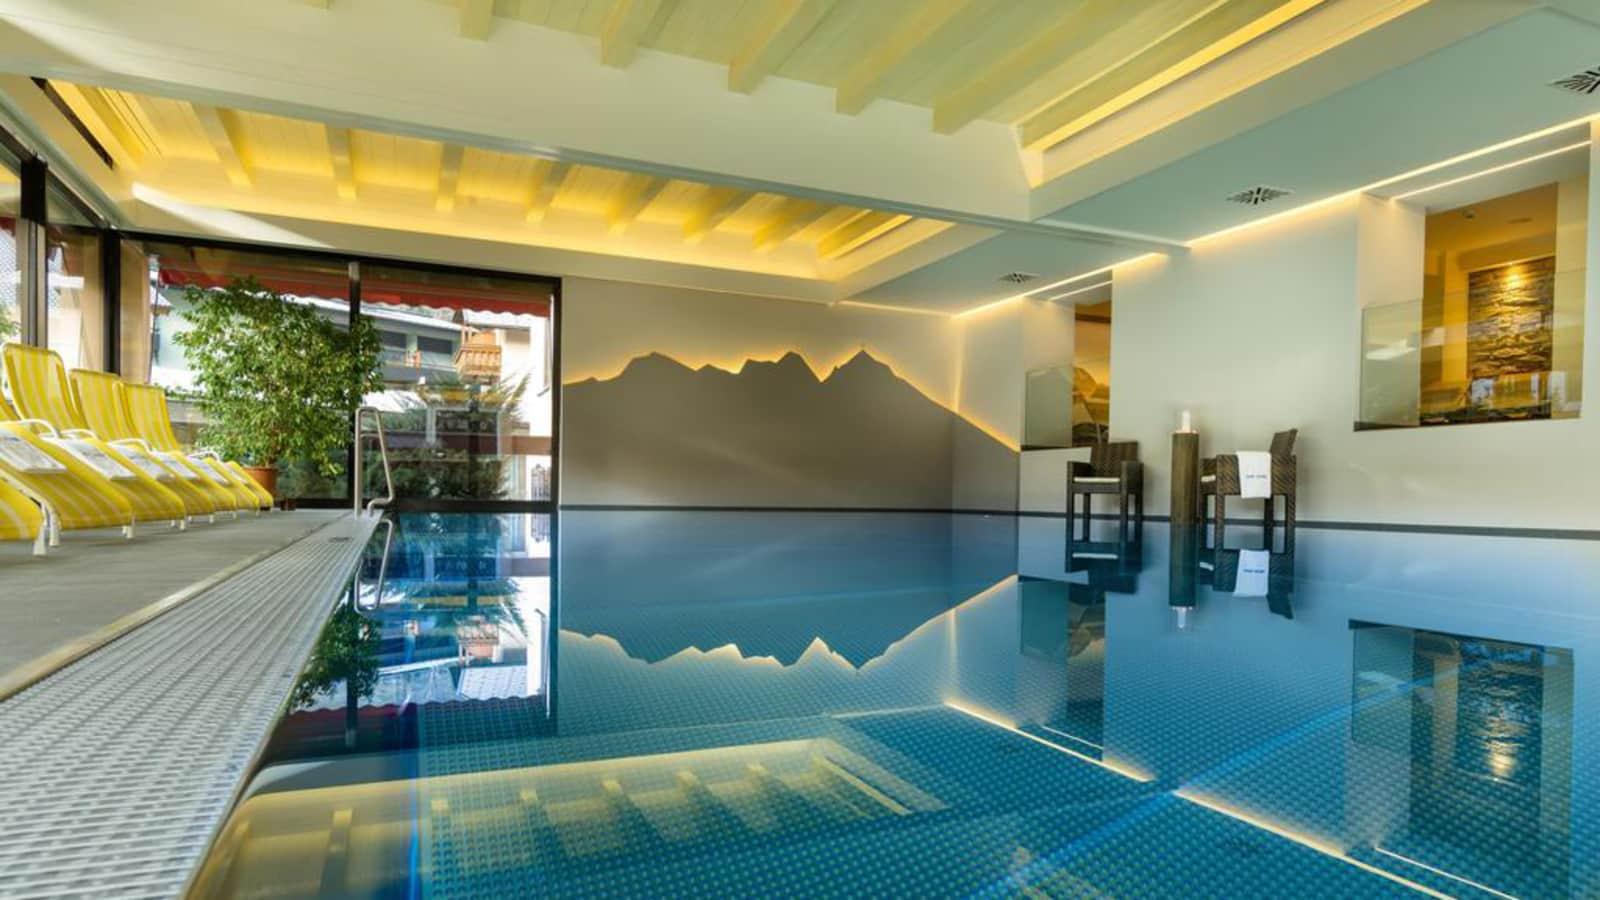 Alpina Hotel Hotel Alpina Bad Hofgastein Austria Ski Holidays From Topflightie